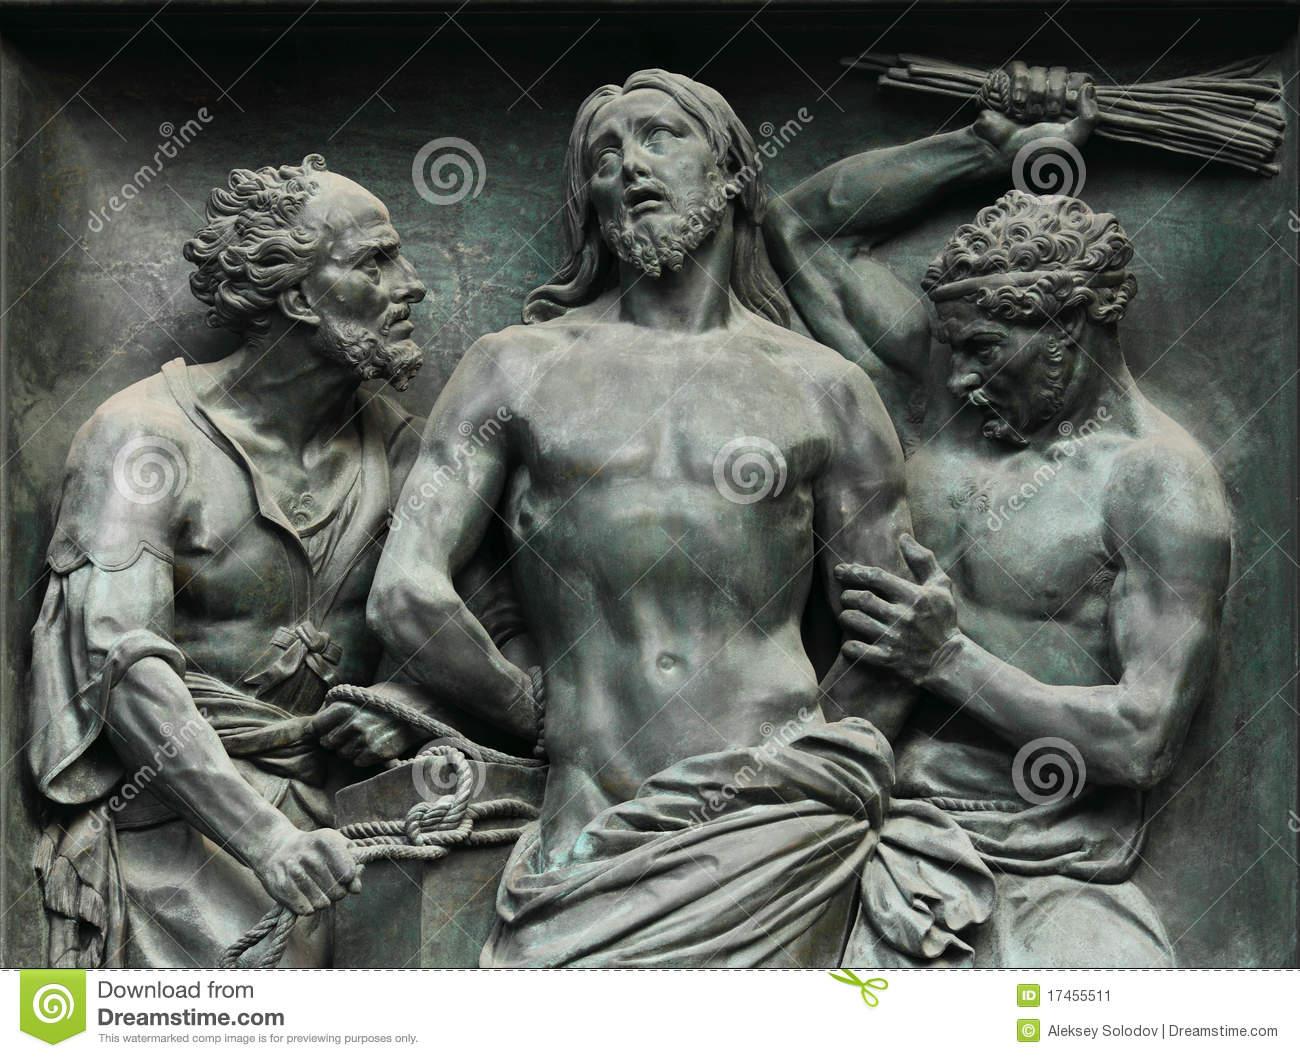 Castigation of the Christ